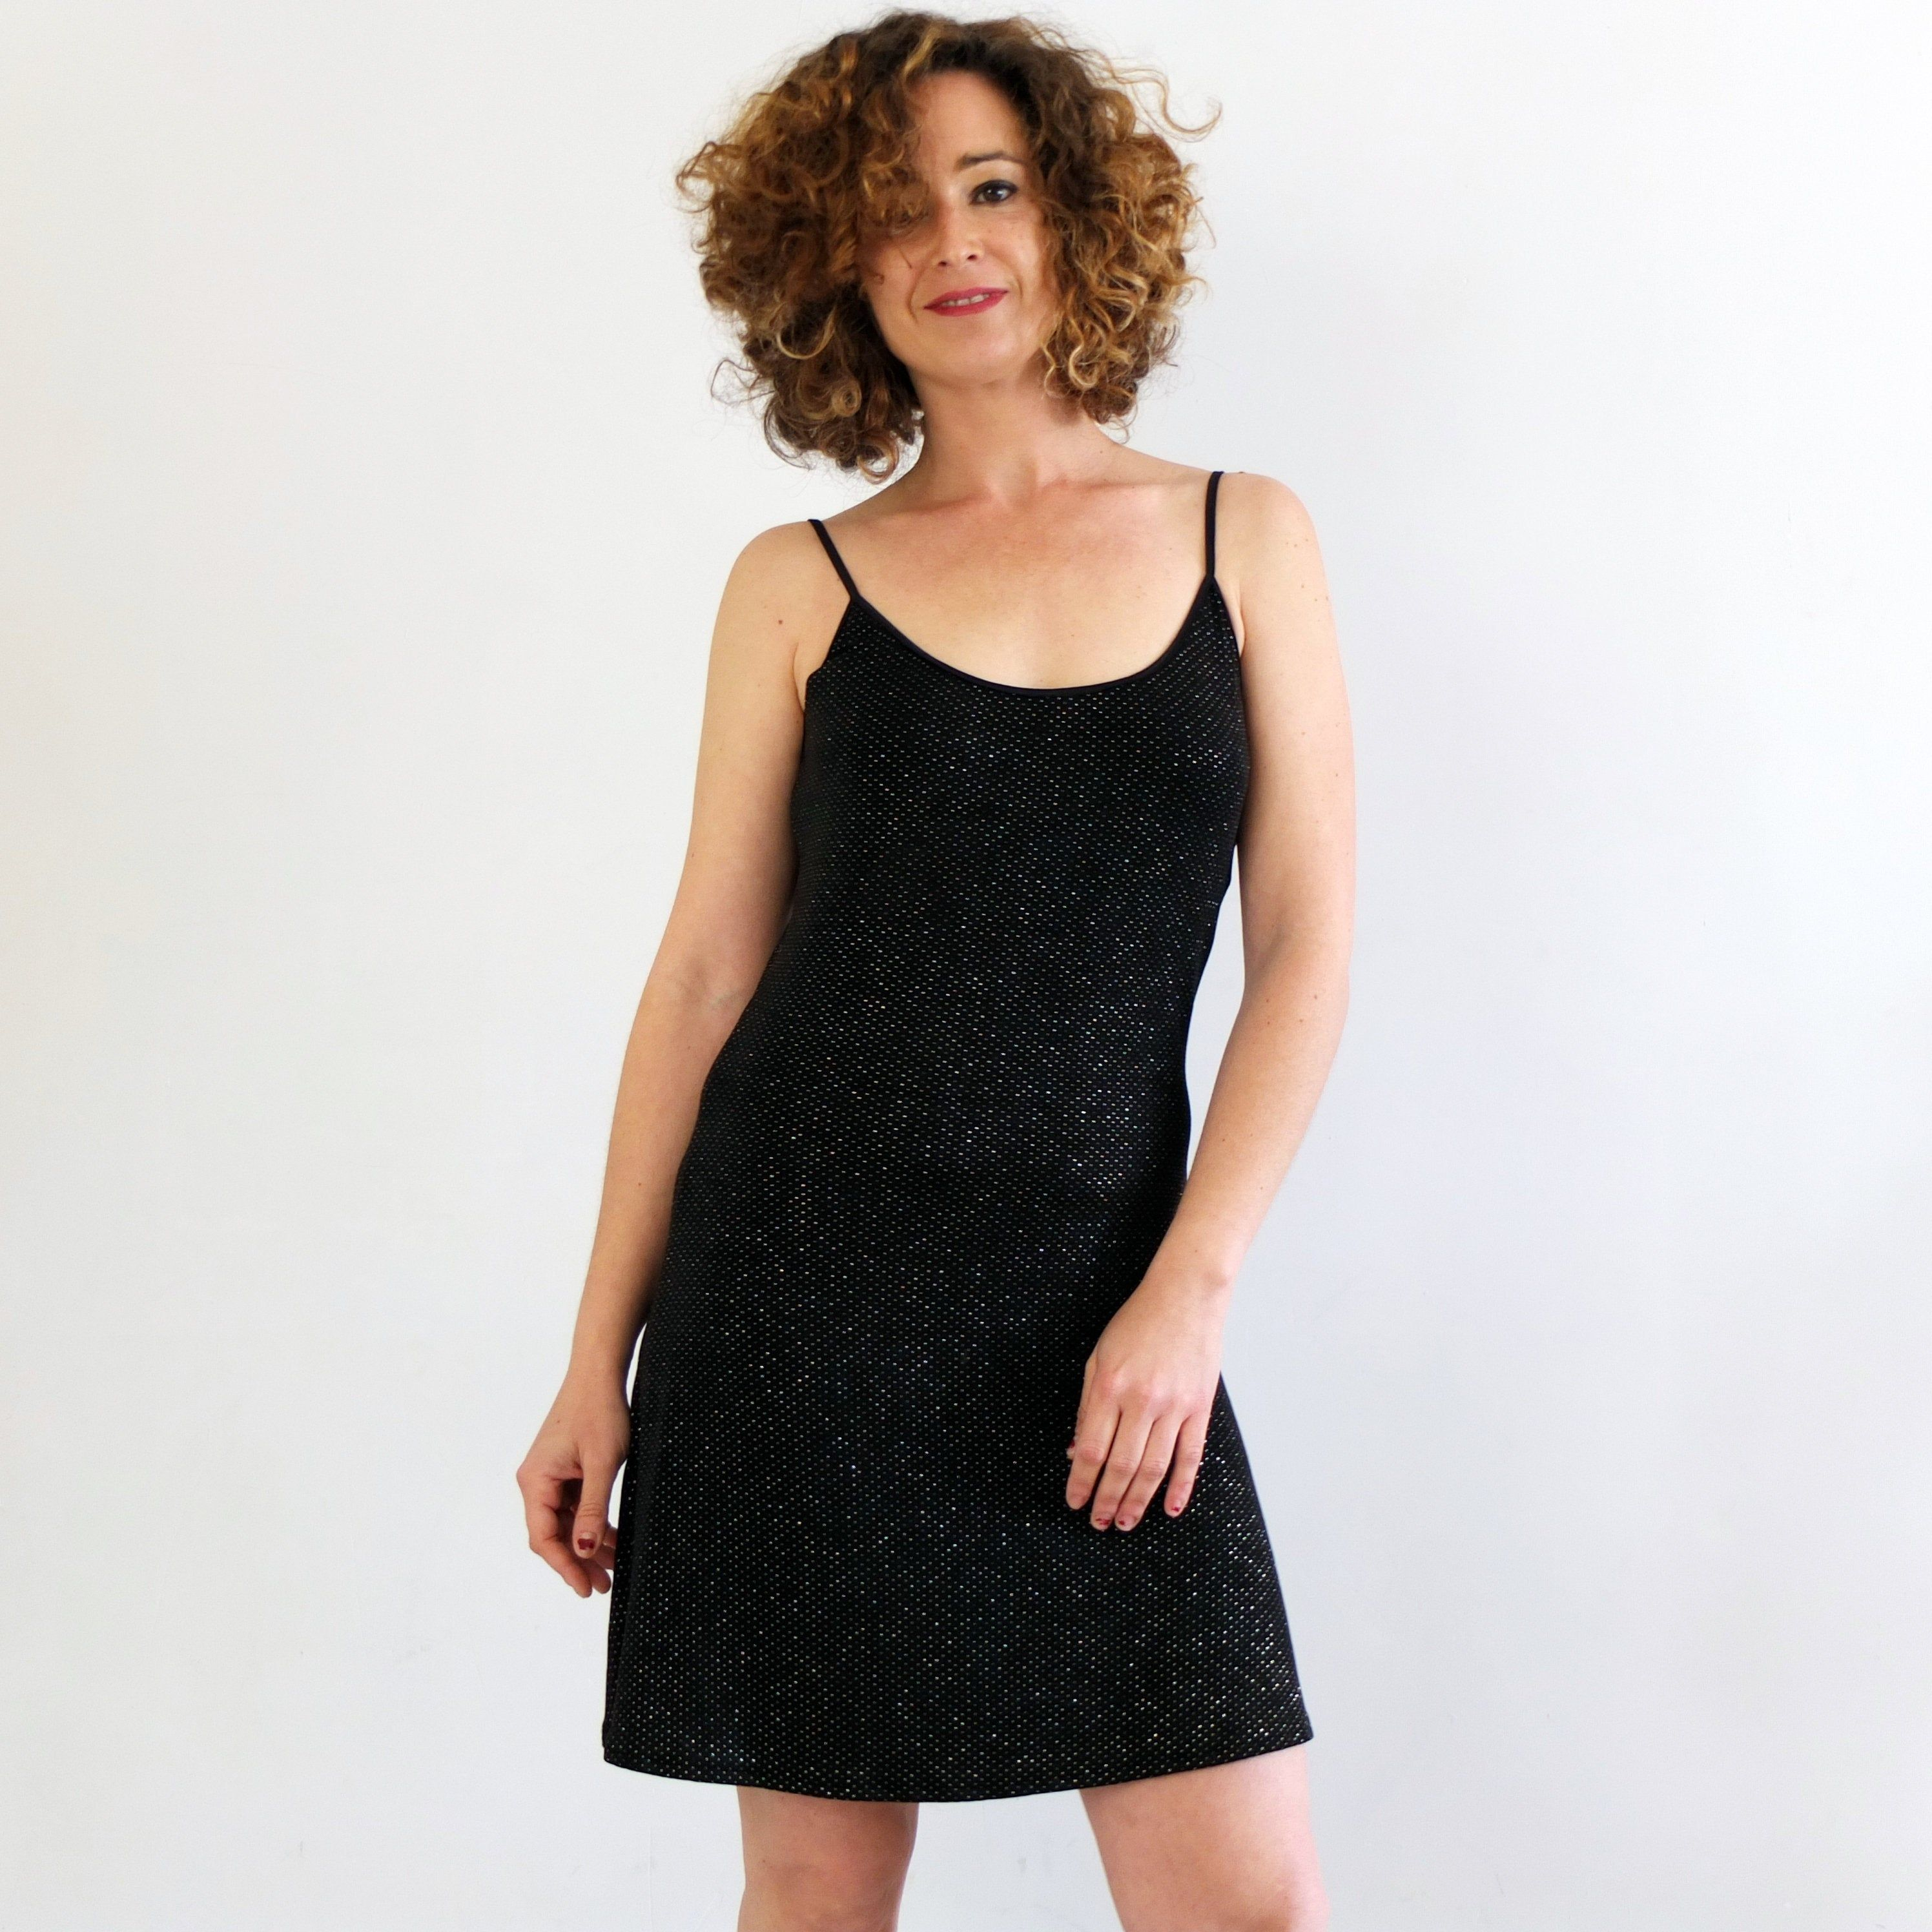 90s Minimal Black Slip Dress Gold Glitter Black Mini Dress Etsy Black Slip Dress Mini Black Dress Black Slip Ons [ 2992 x 2992 Pixel ]